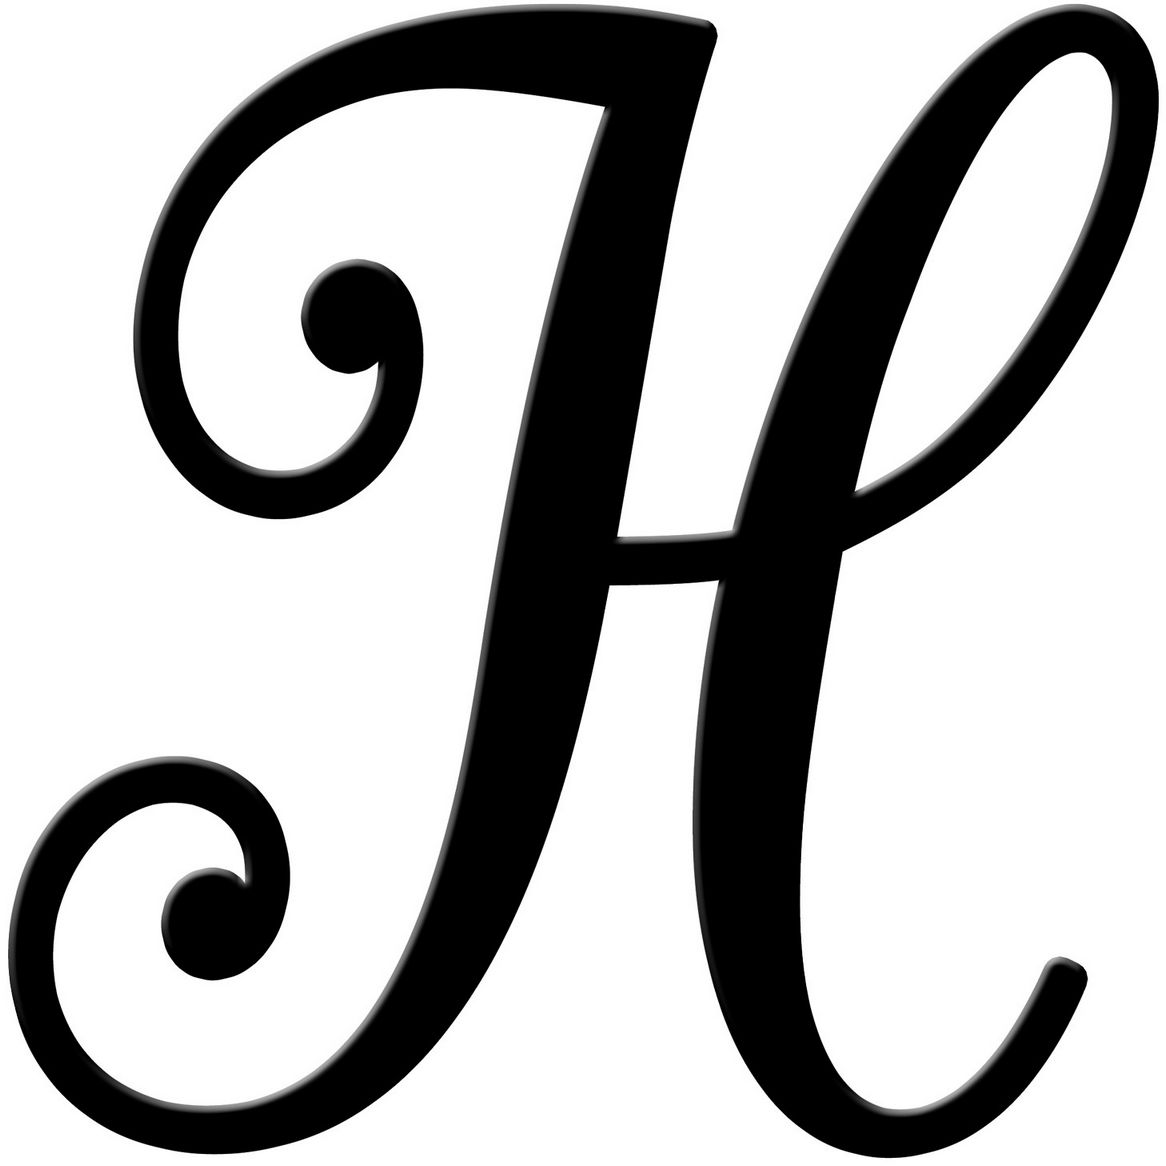 Fancy Cursive Black Letter H Free Image